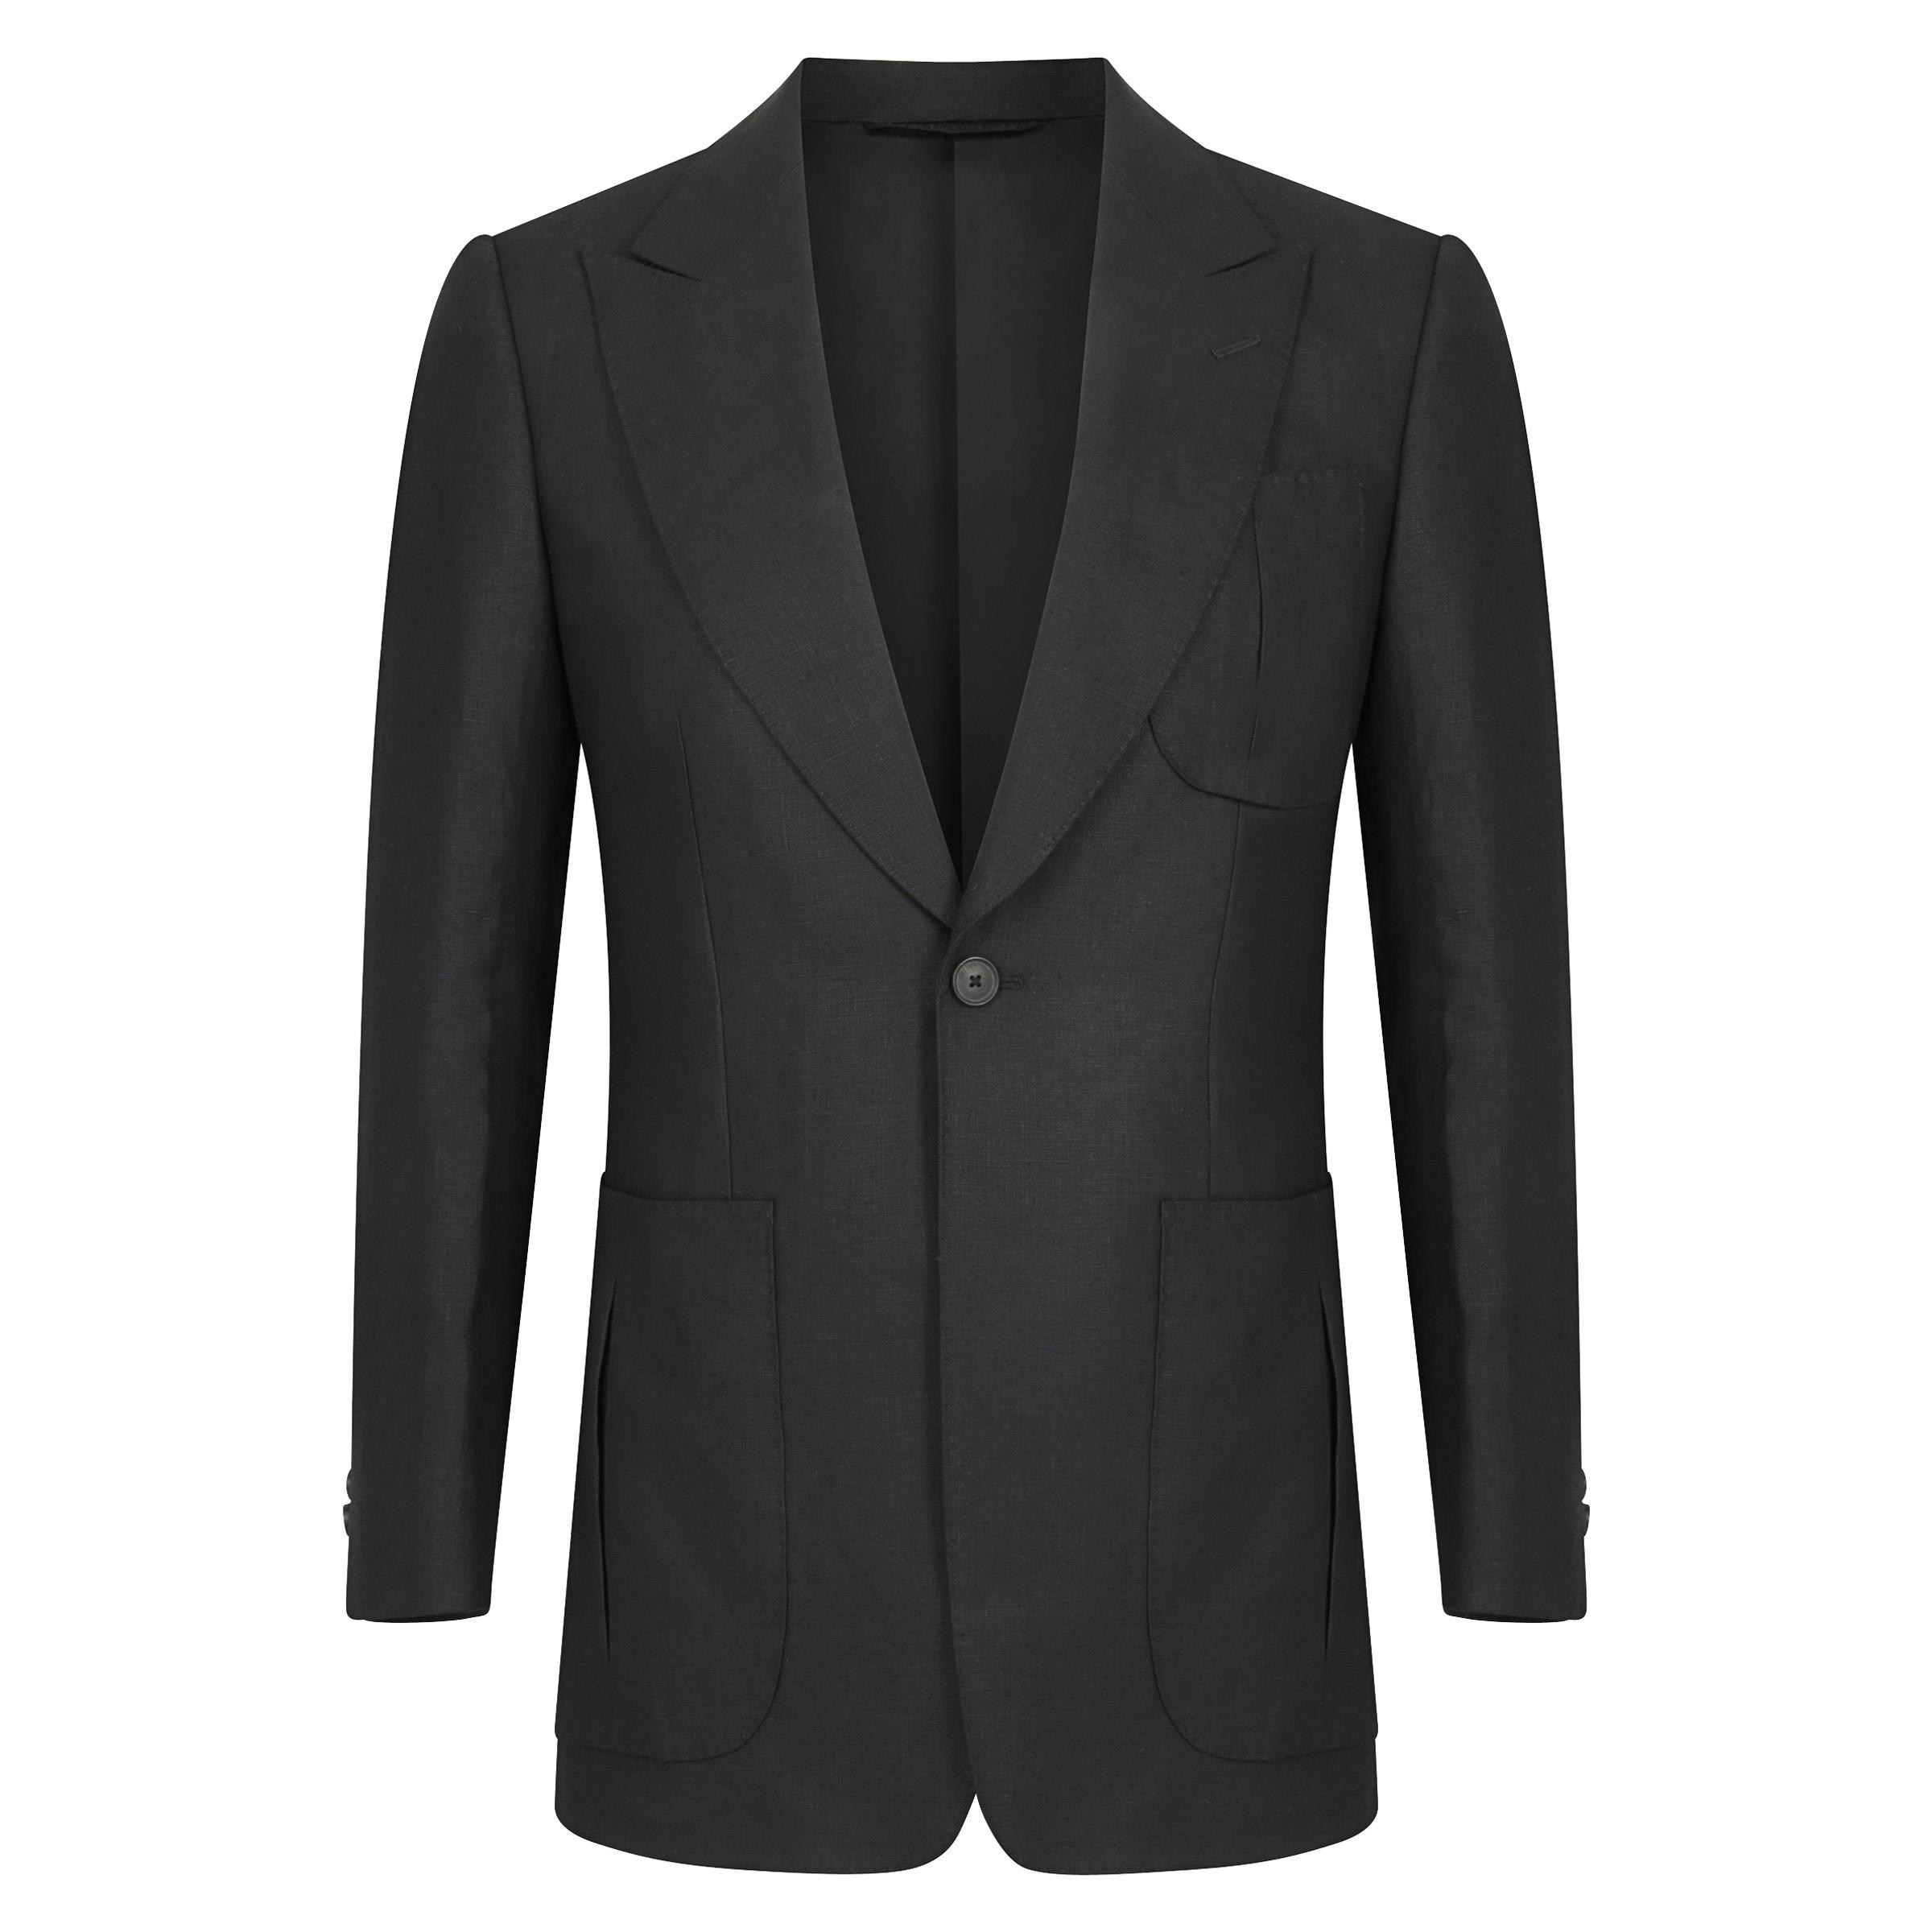 Black Linen Single-Breasted Jacket